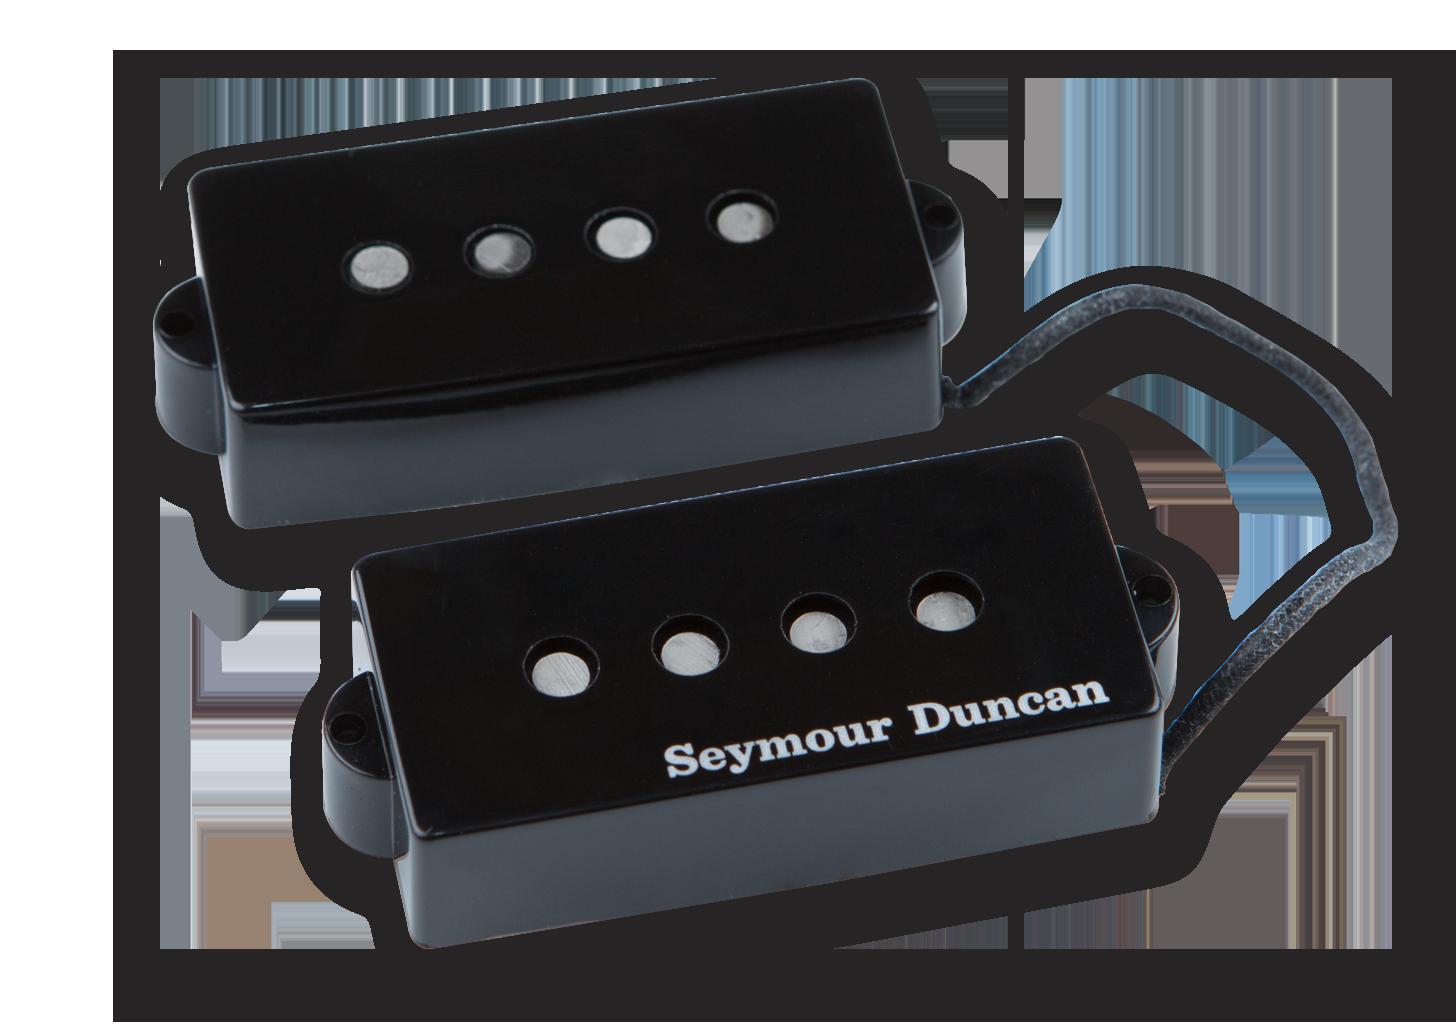 Seymour Duncan Vintage P-Bass (SPB-1)